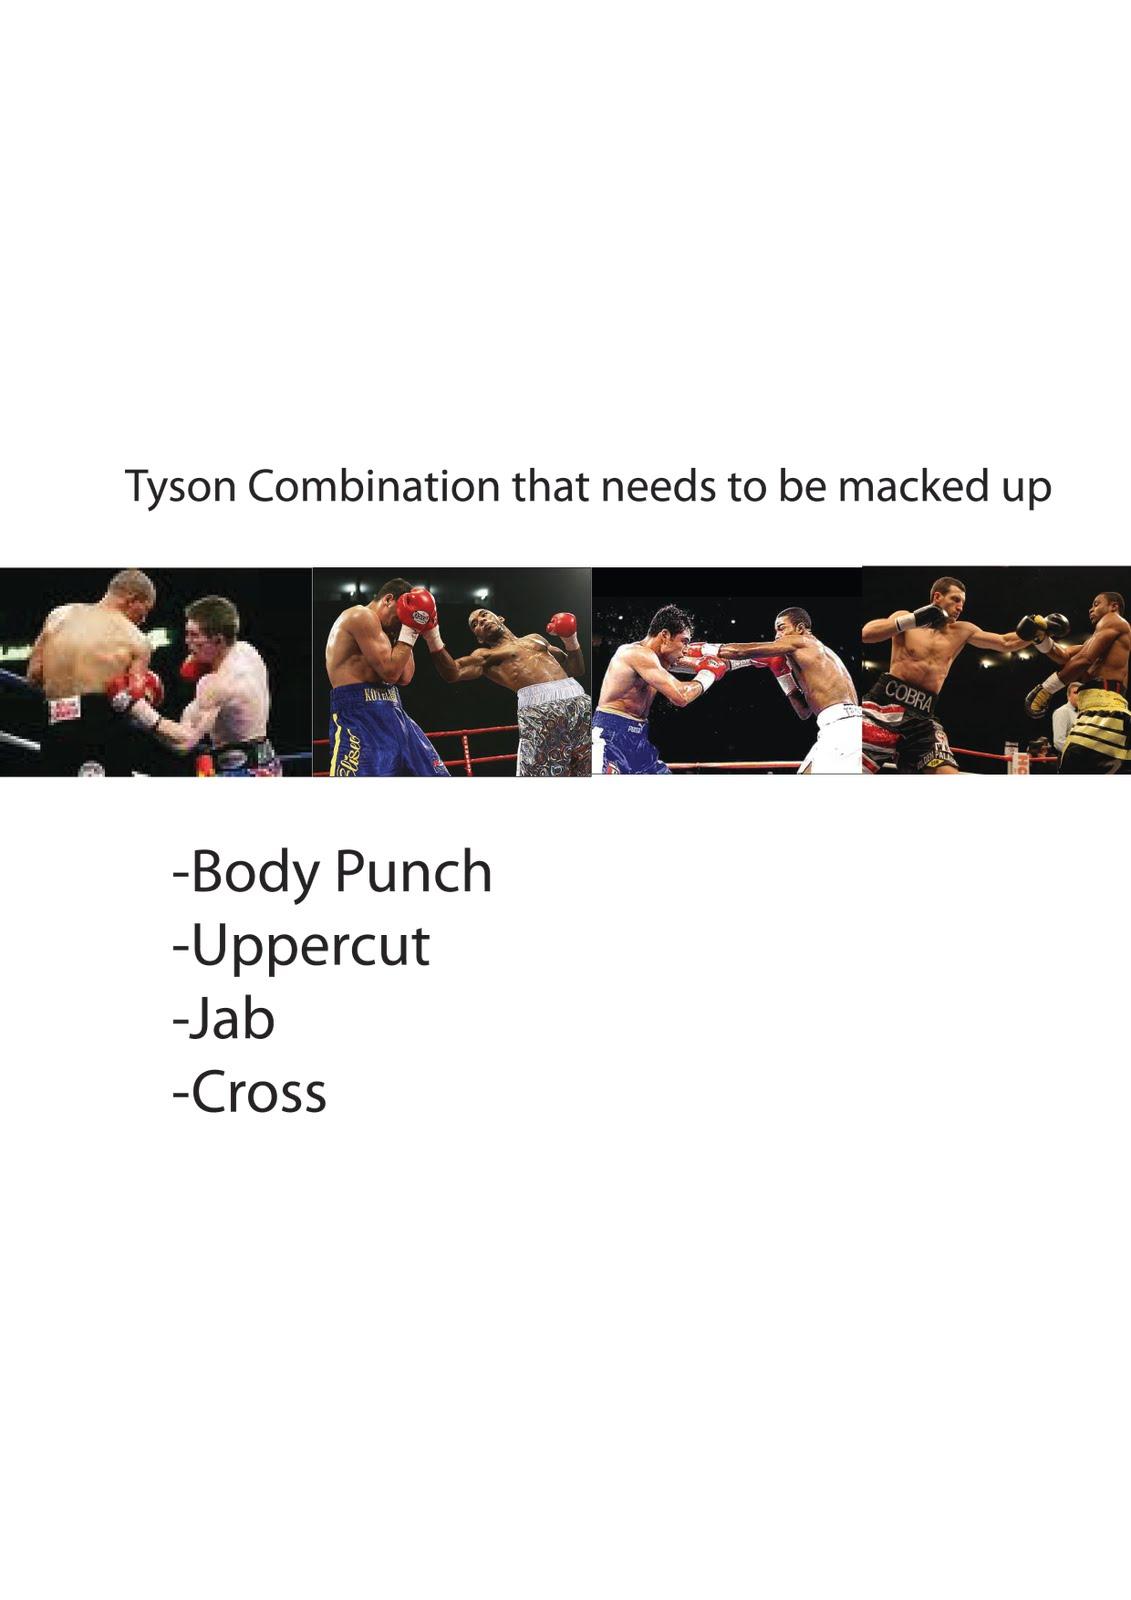 http://3.bp.blogspot.com/_IJgkyYOEF4Y/TBD4APLI4JI/AAAAAAAAAPo/sTIBaGNWQH0/s1600/Tyson+Combinaton.jpg